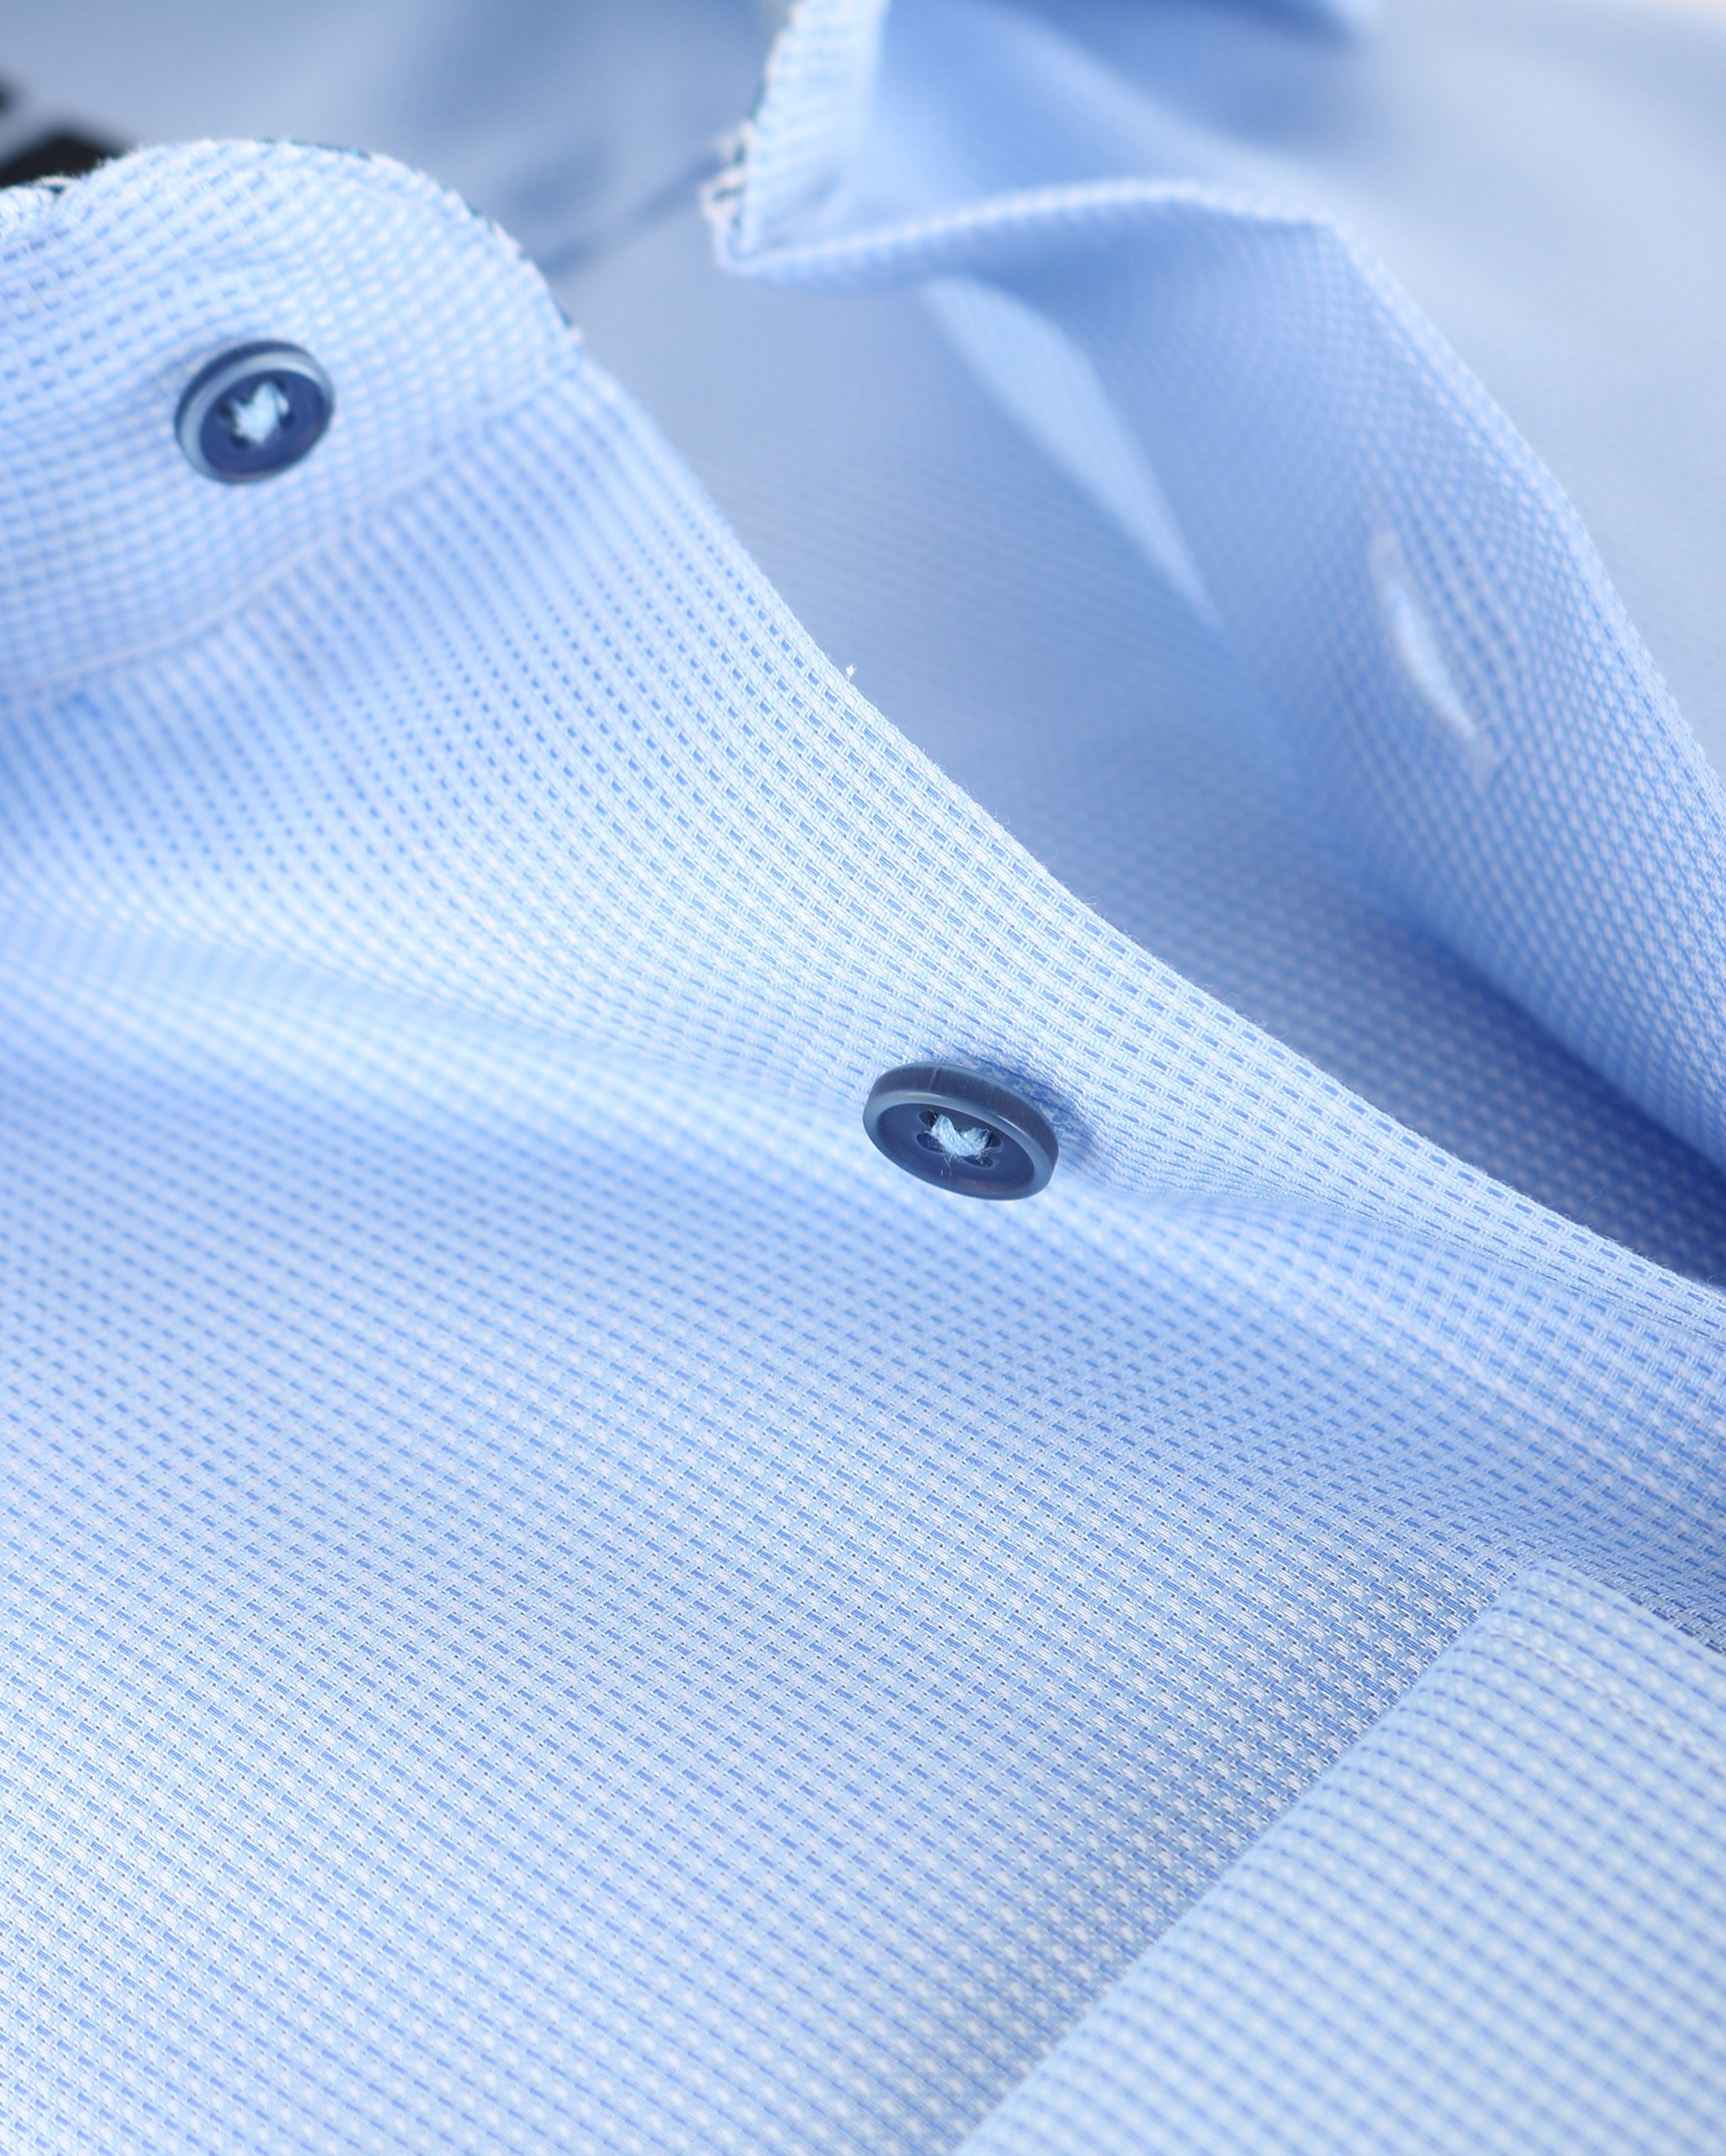 Michaelis Overhemd Dessin Blauw SL7 foto 2